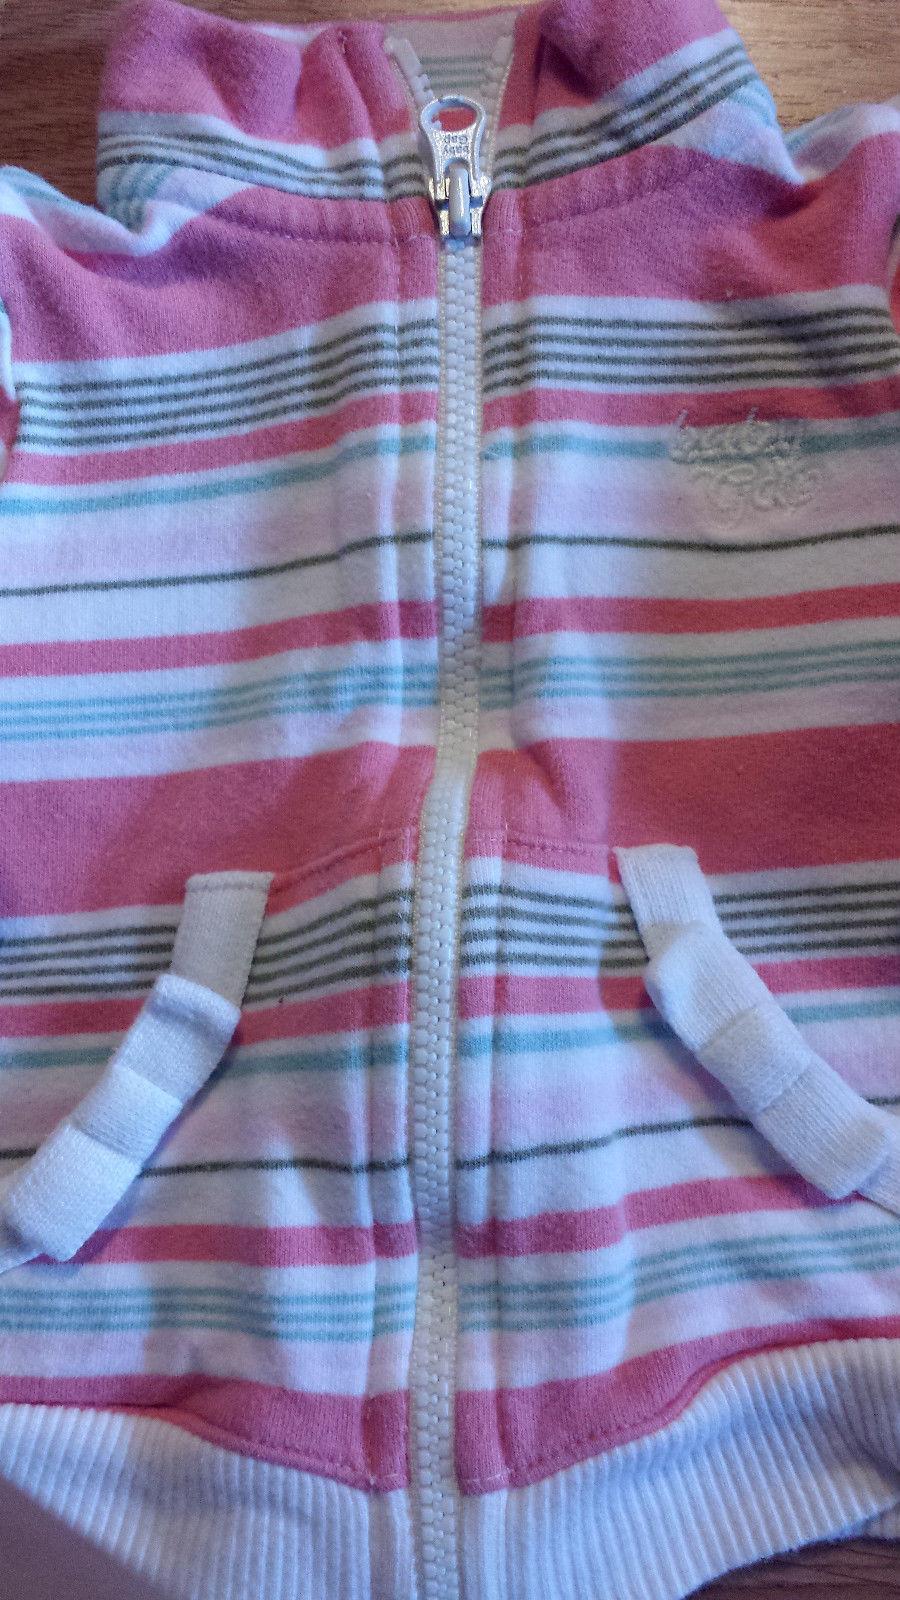 Girl's Size 0-3 M Months 3 Pc Peach Striped Baby Gap Jacket, Denim Jeans + Top